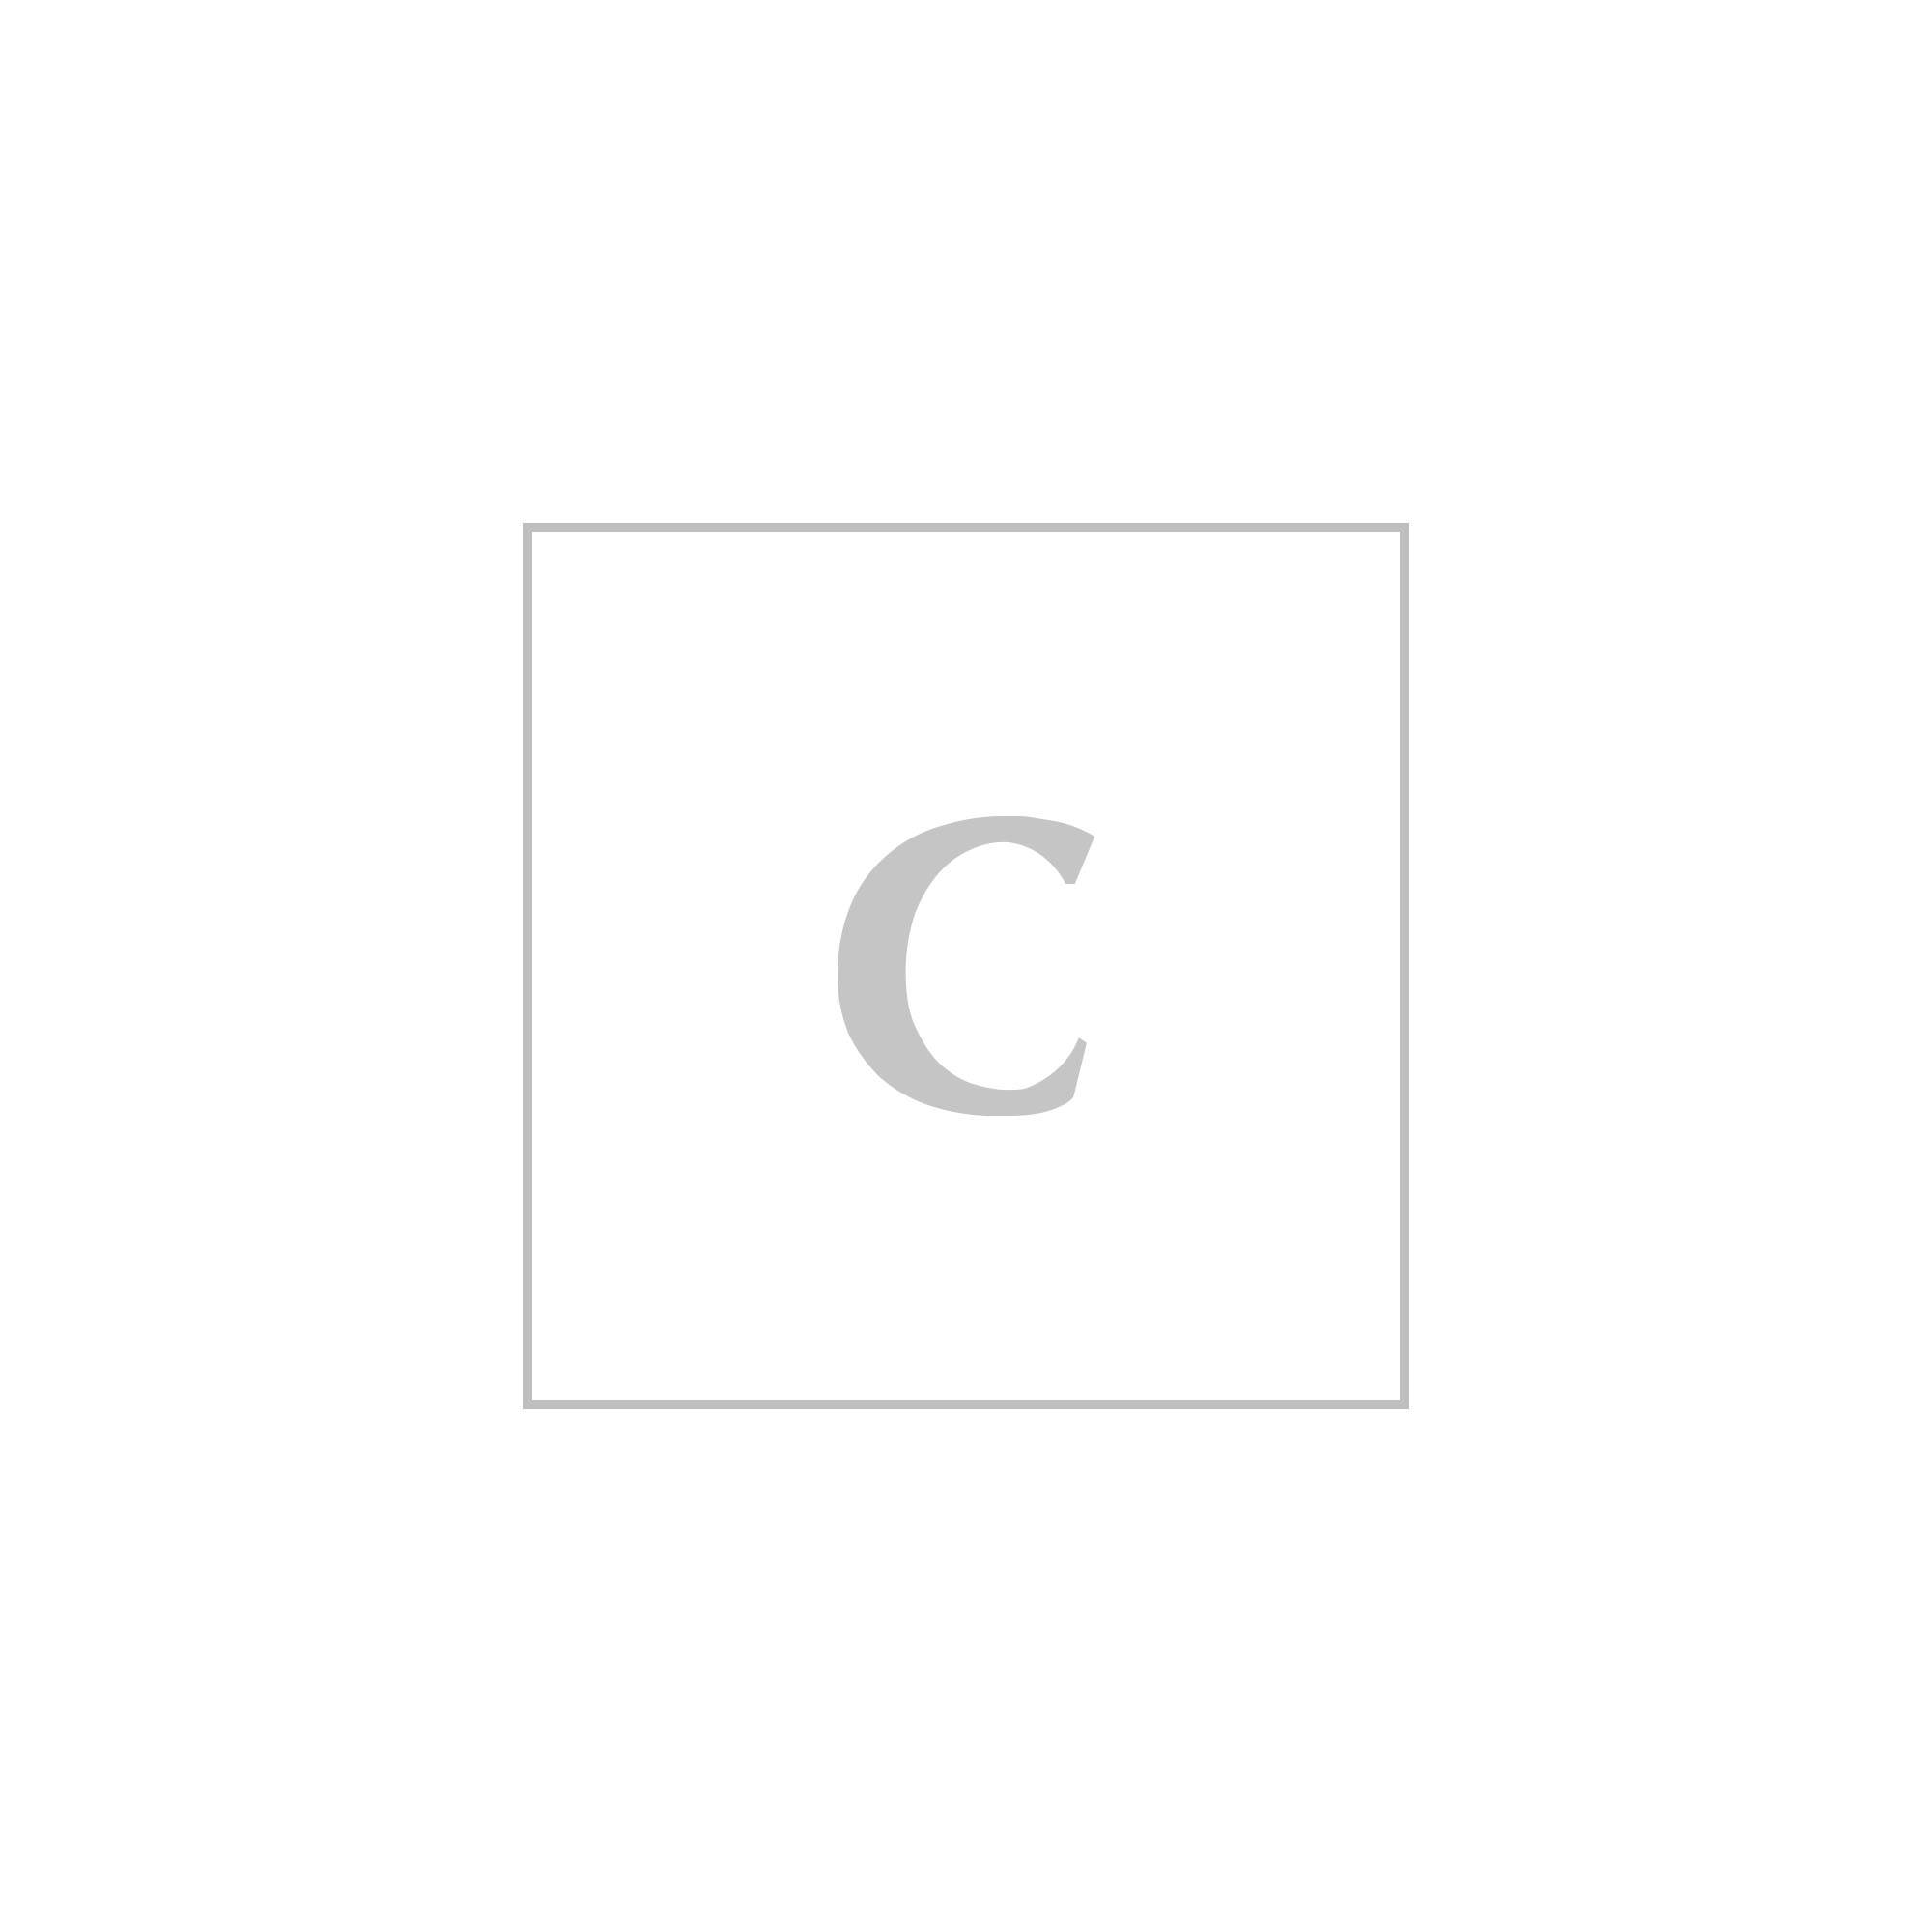 Roberto cavalli fin de siècle trousers